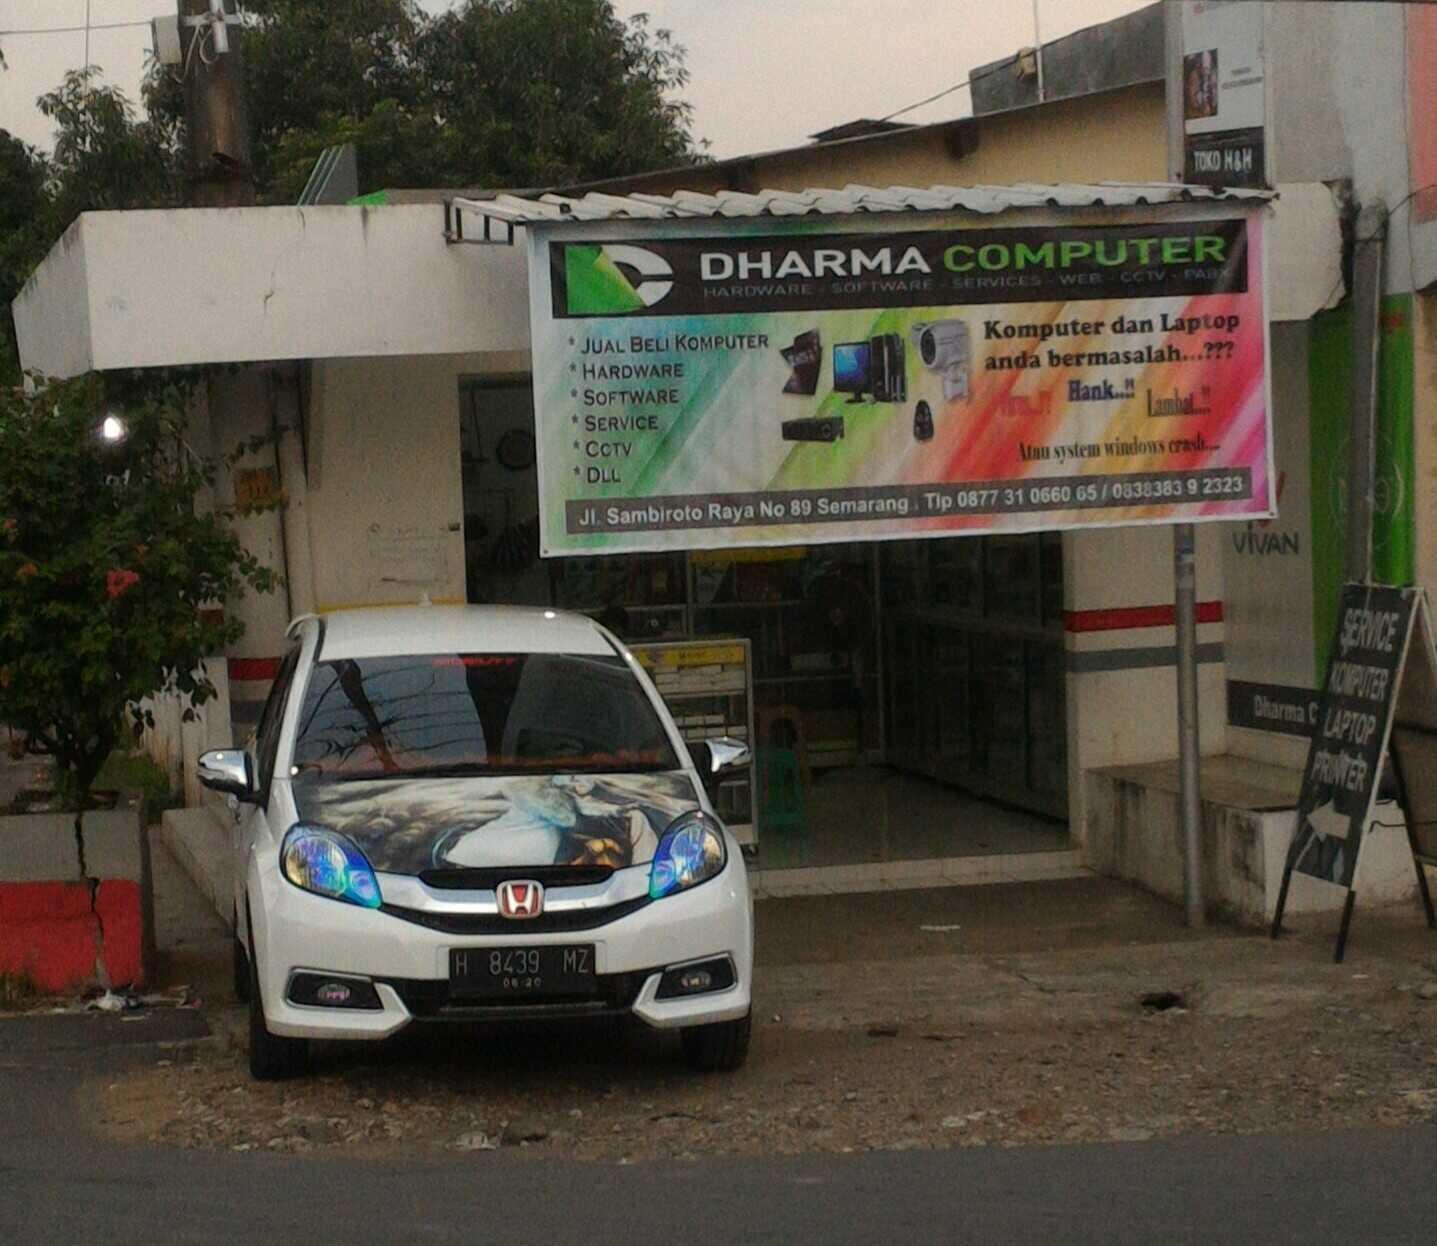 Dharma Komputer